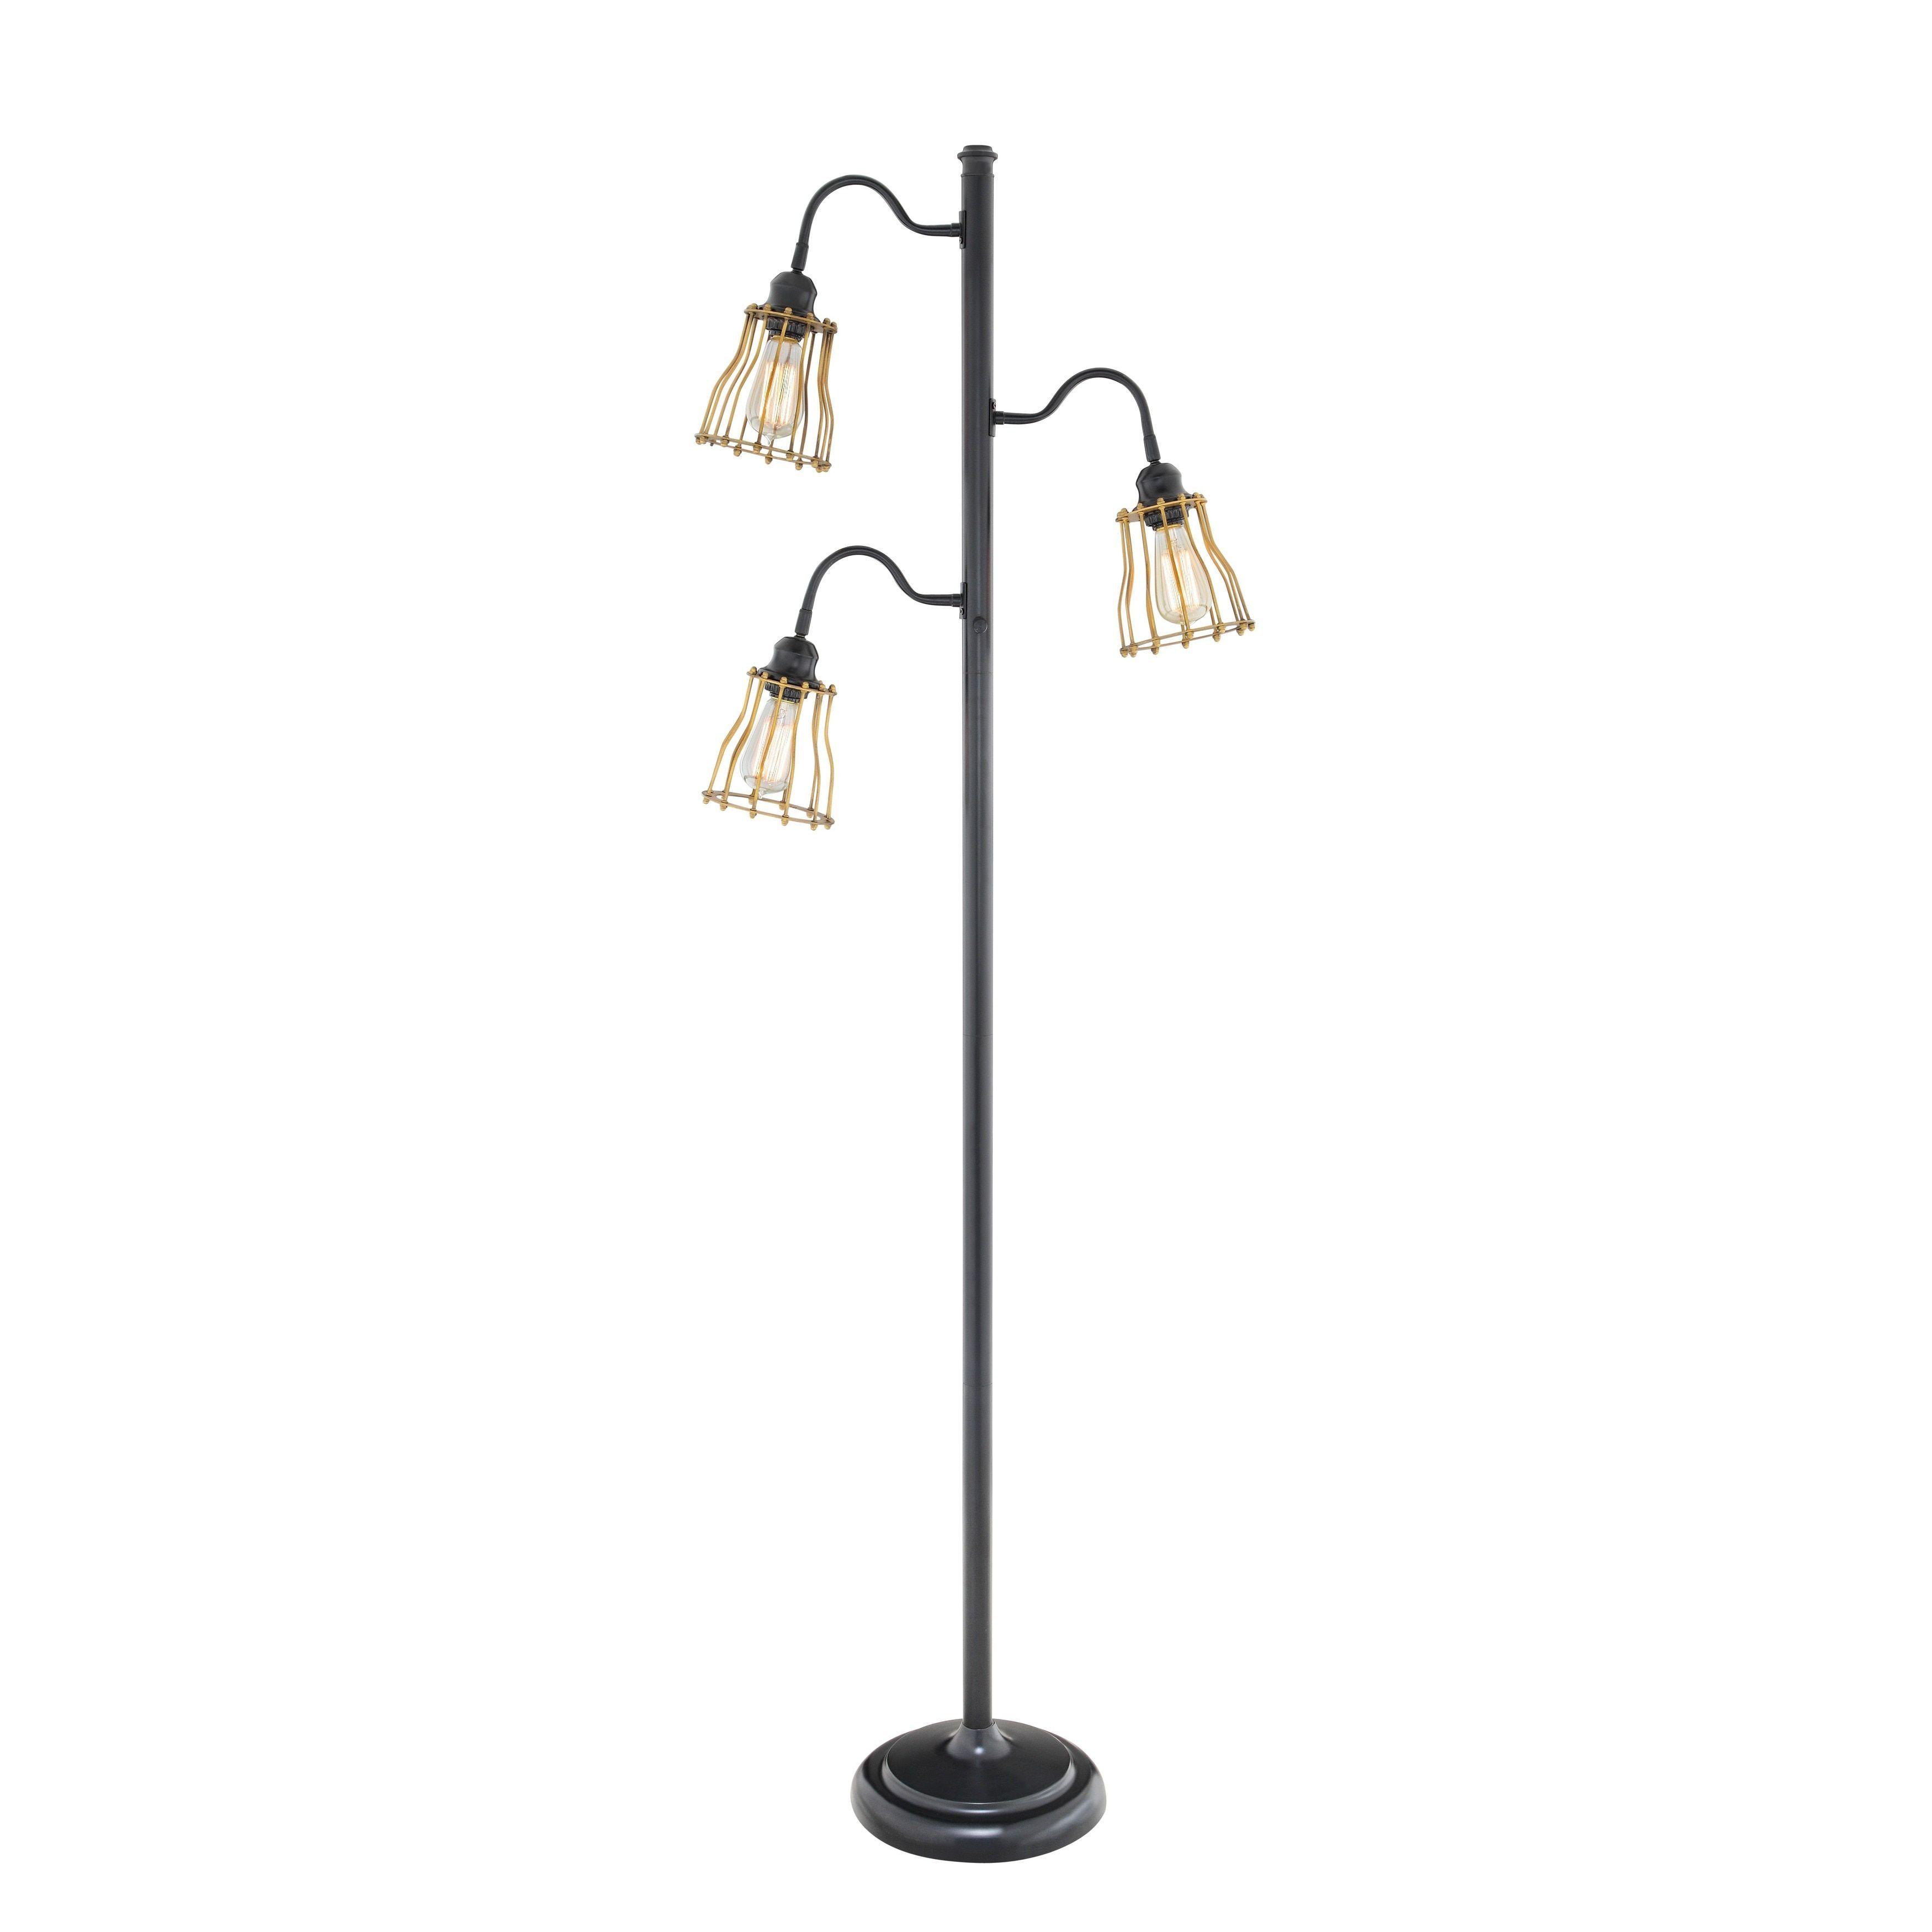 3 Light Floor Lamp Unique Evolution Catalina 3Light Black Metal Track Tree Floor Lamp Black Decorating Inspiration